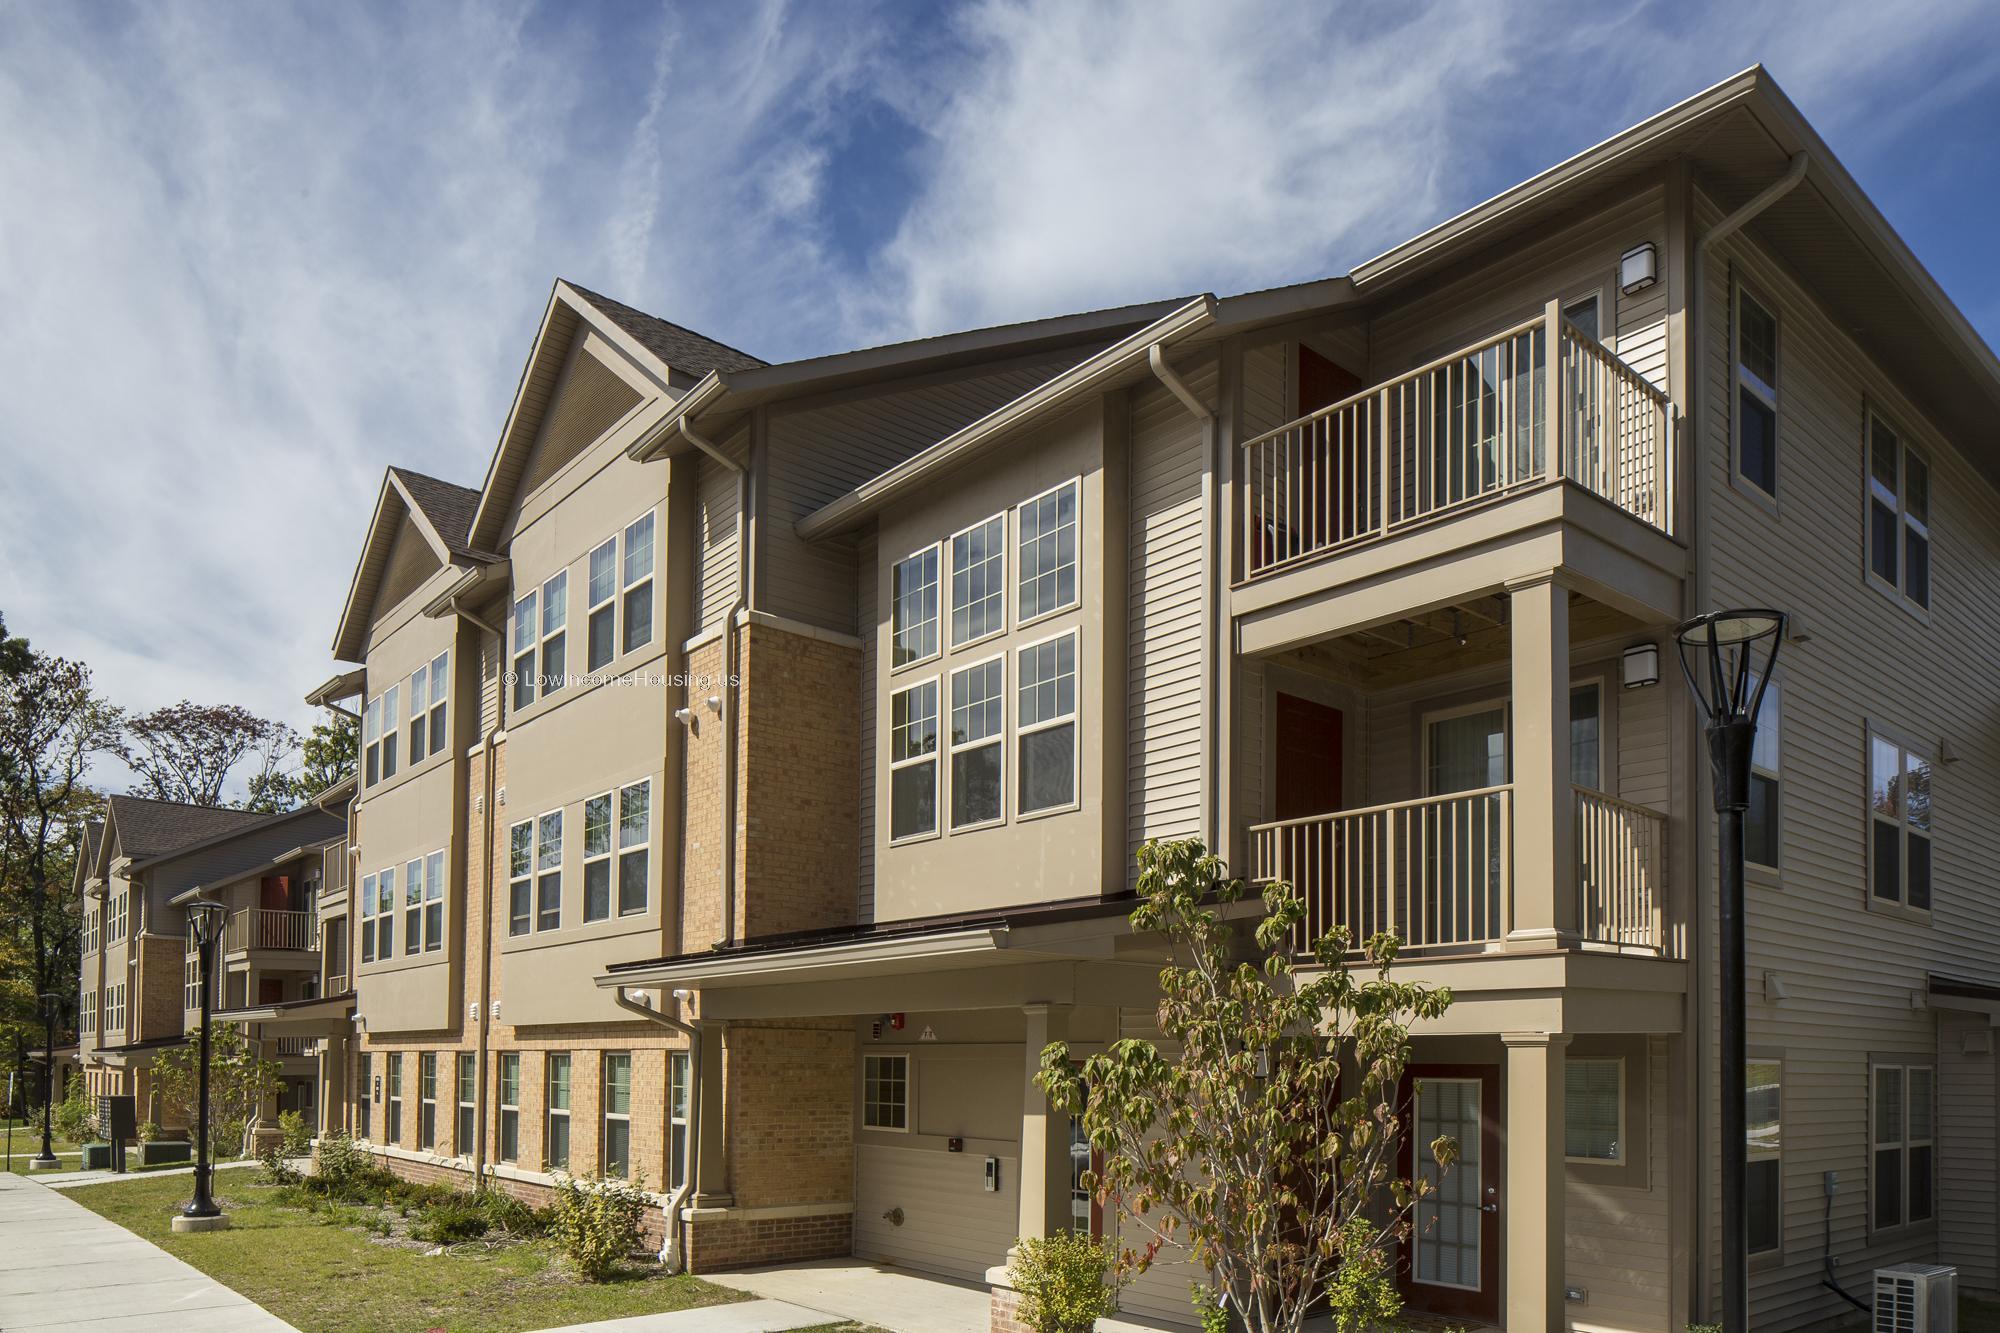 cedar knolls nj low income housing | cedar knolls low income